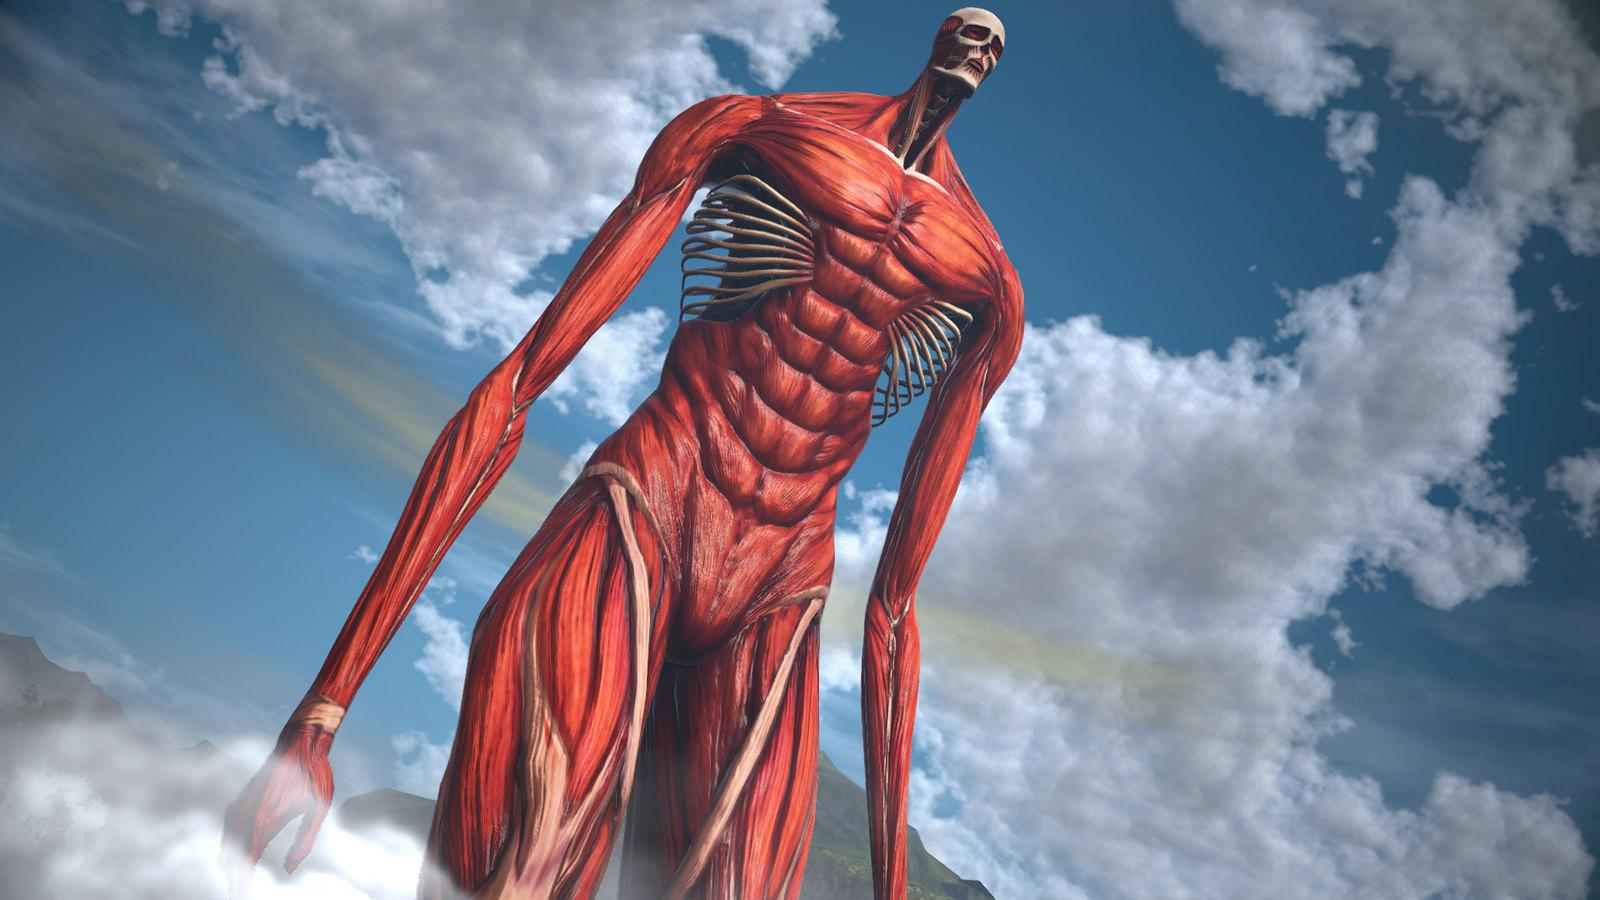 48129413101 36a0e5fb3a h - Werft einen ersten Blick auf den kolossalen neuen Helden, Titan Armin, in Attack on Titan 2: Final Battle